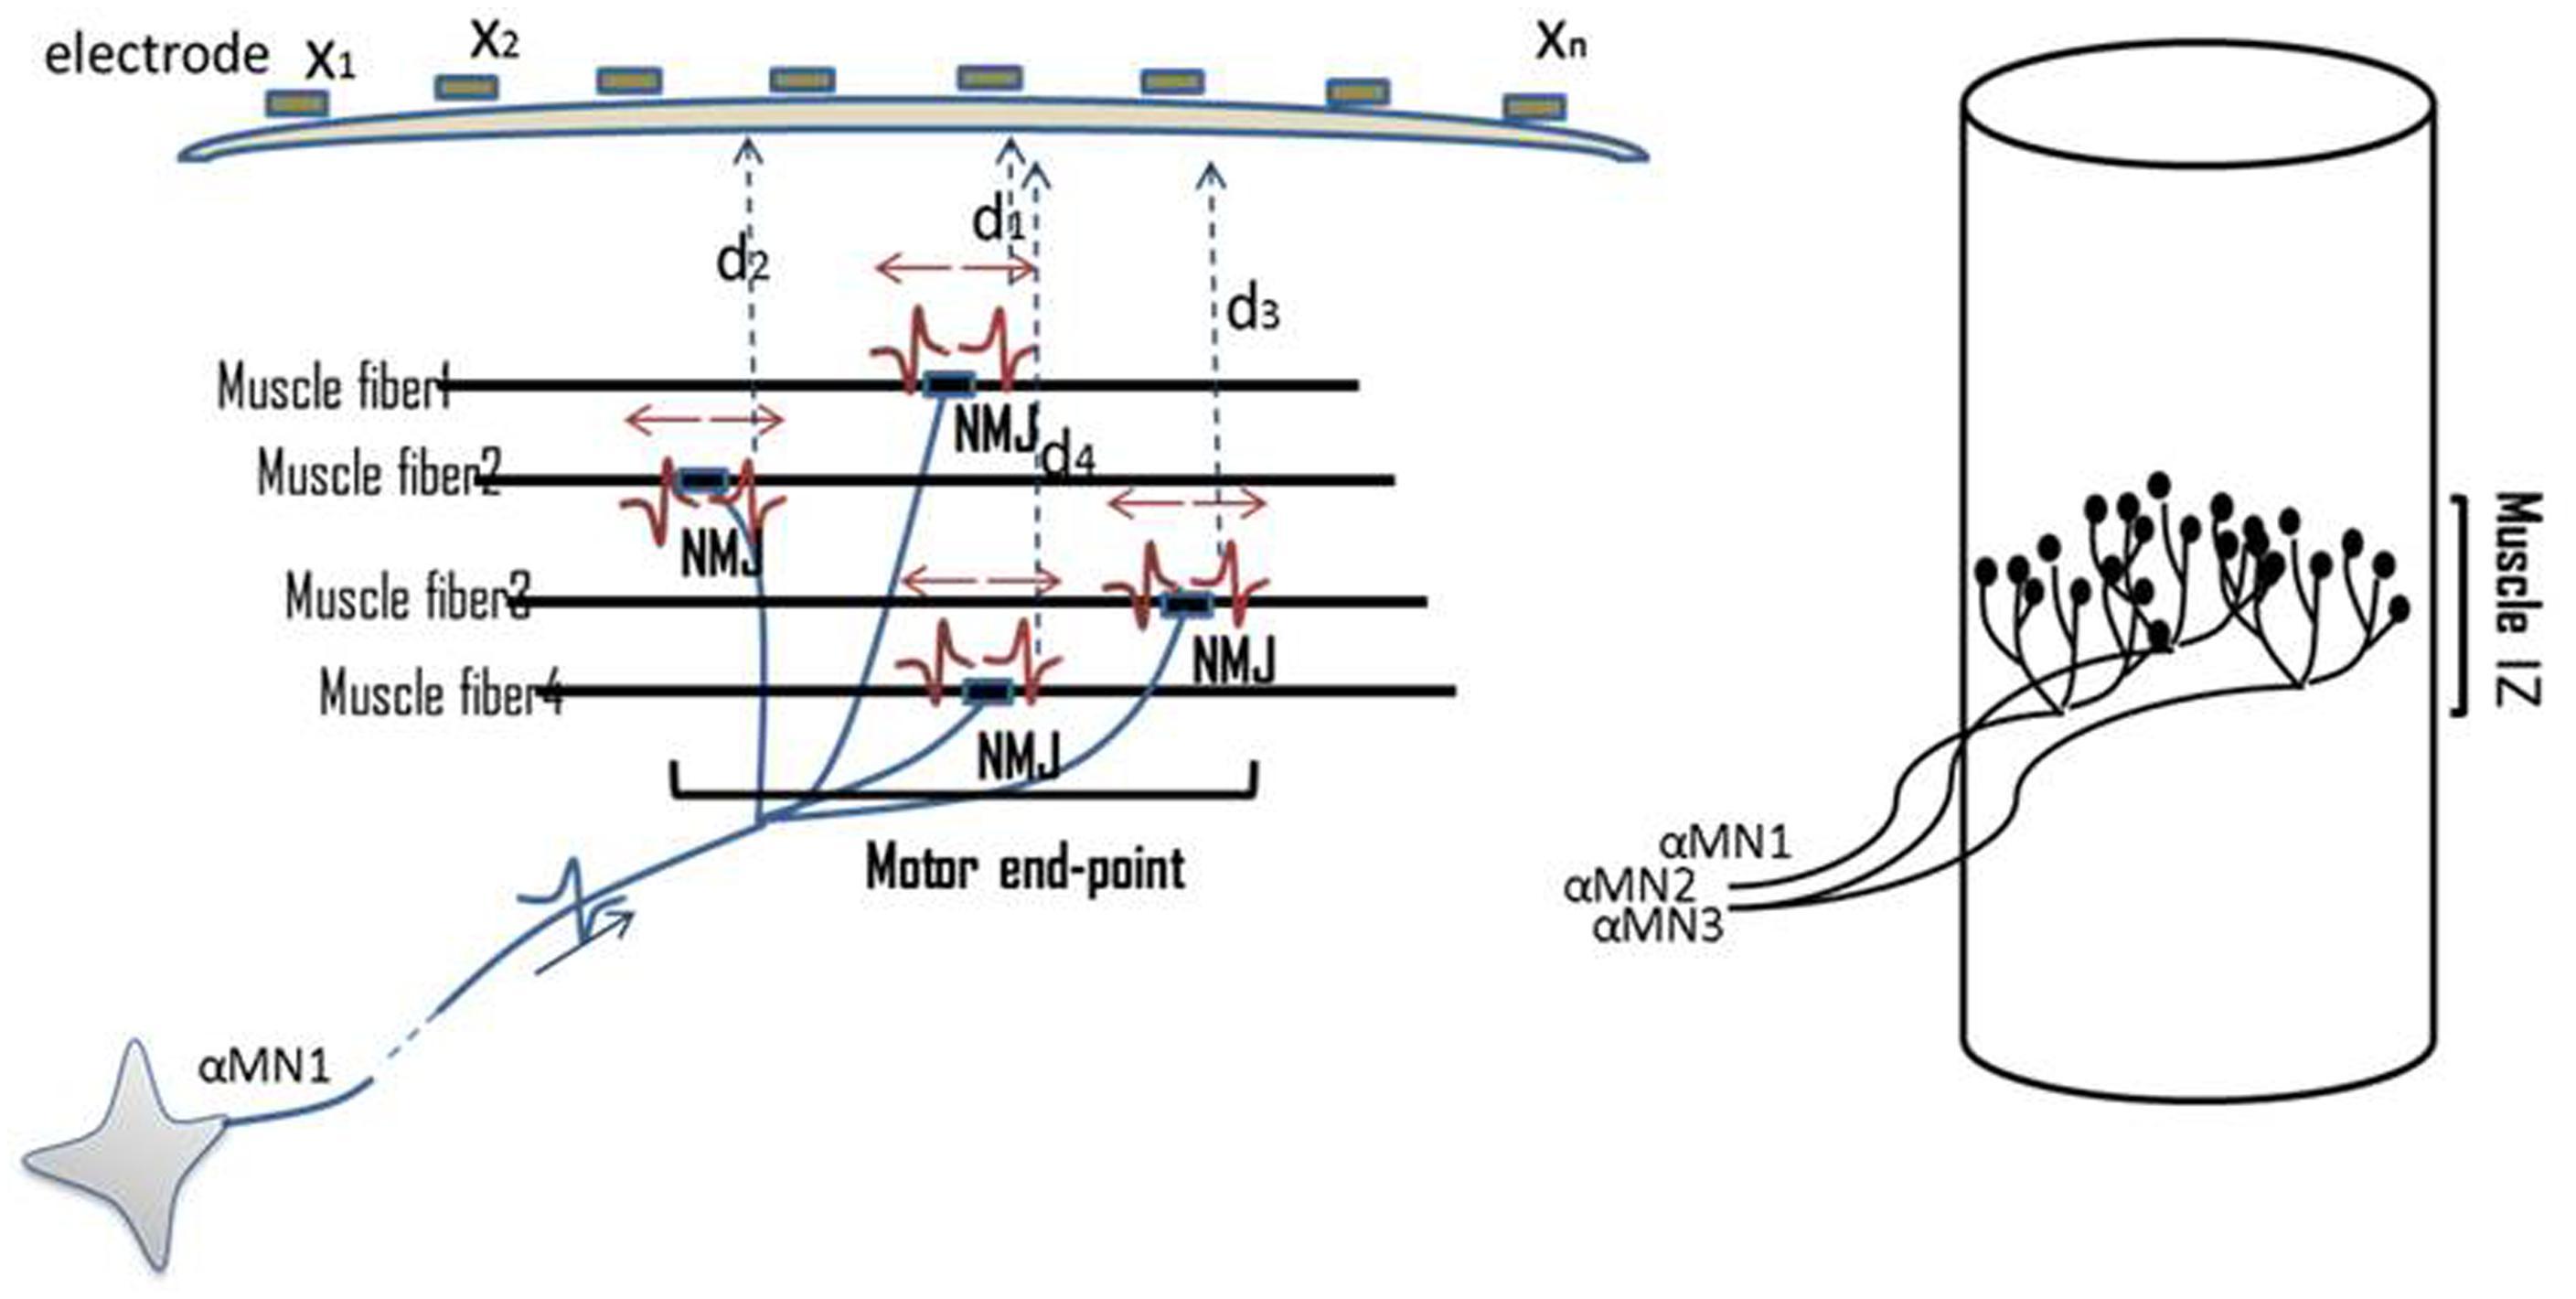 Frontiers Innervation Zones Of Fasciculating Motor Units Figure 1 Block Diagram The Emg Sensor